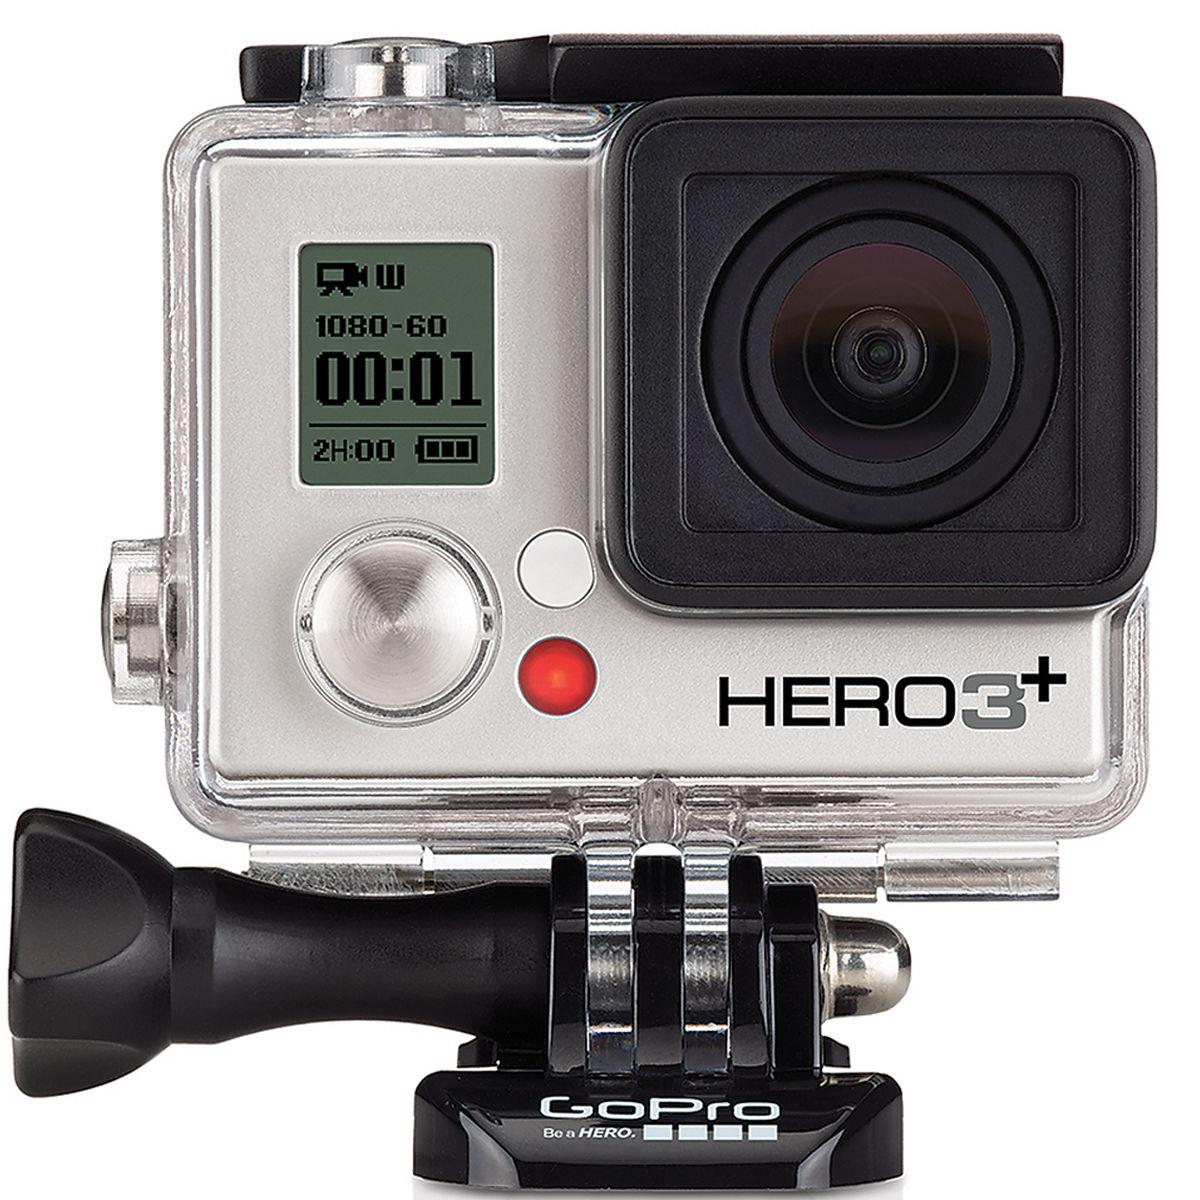 GoPro HERO3+ Silver Edition Camera Manufacturer Refurbished $180 via GoPro EBay store